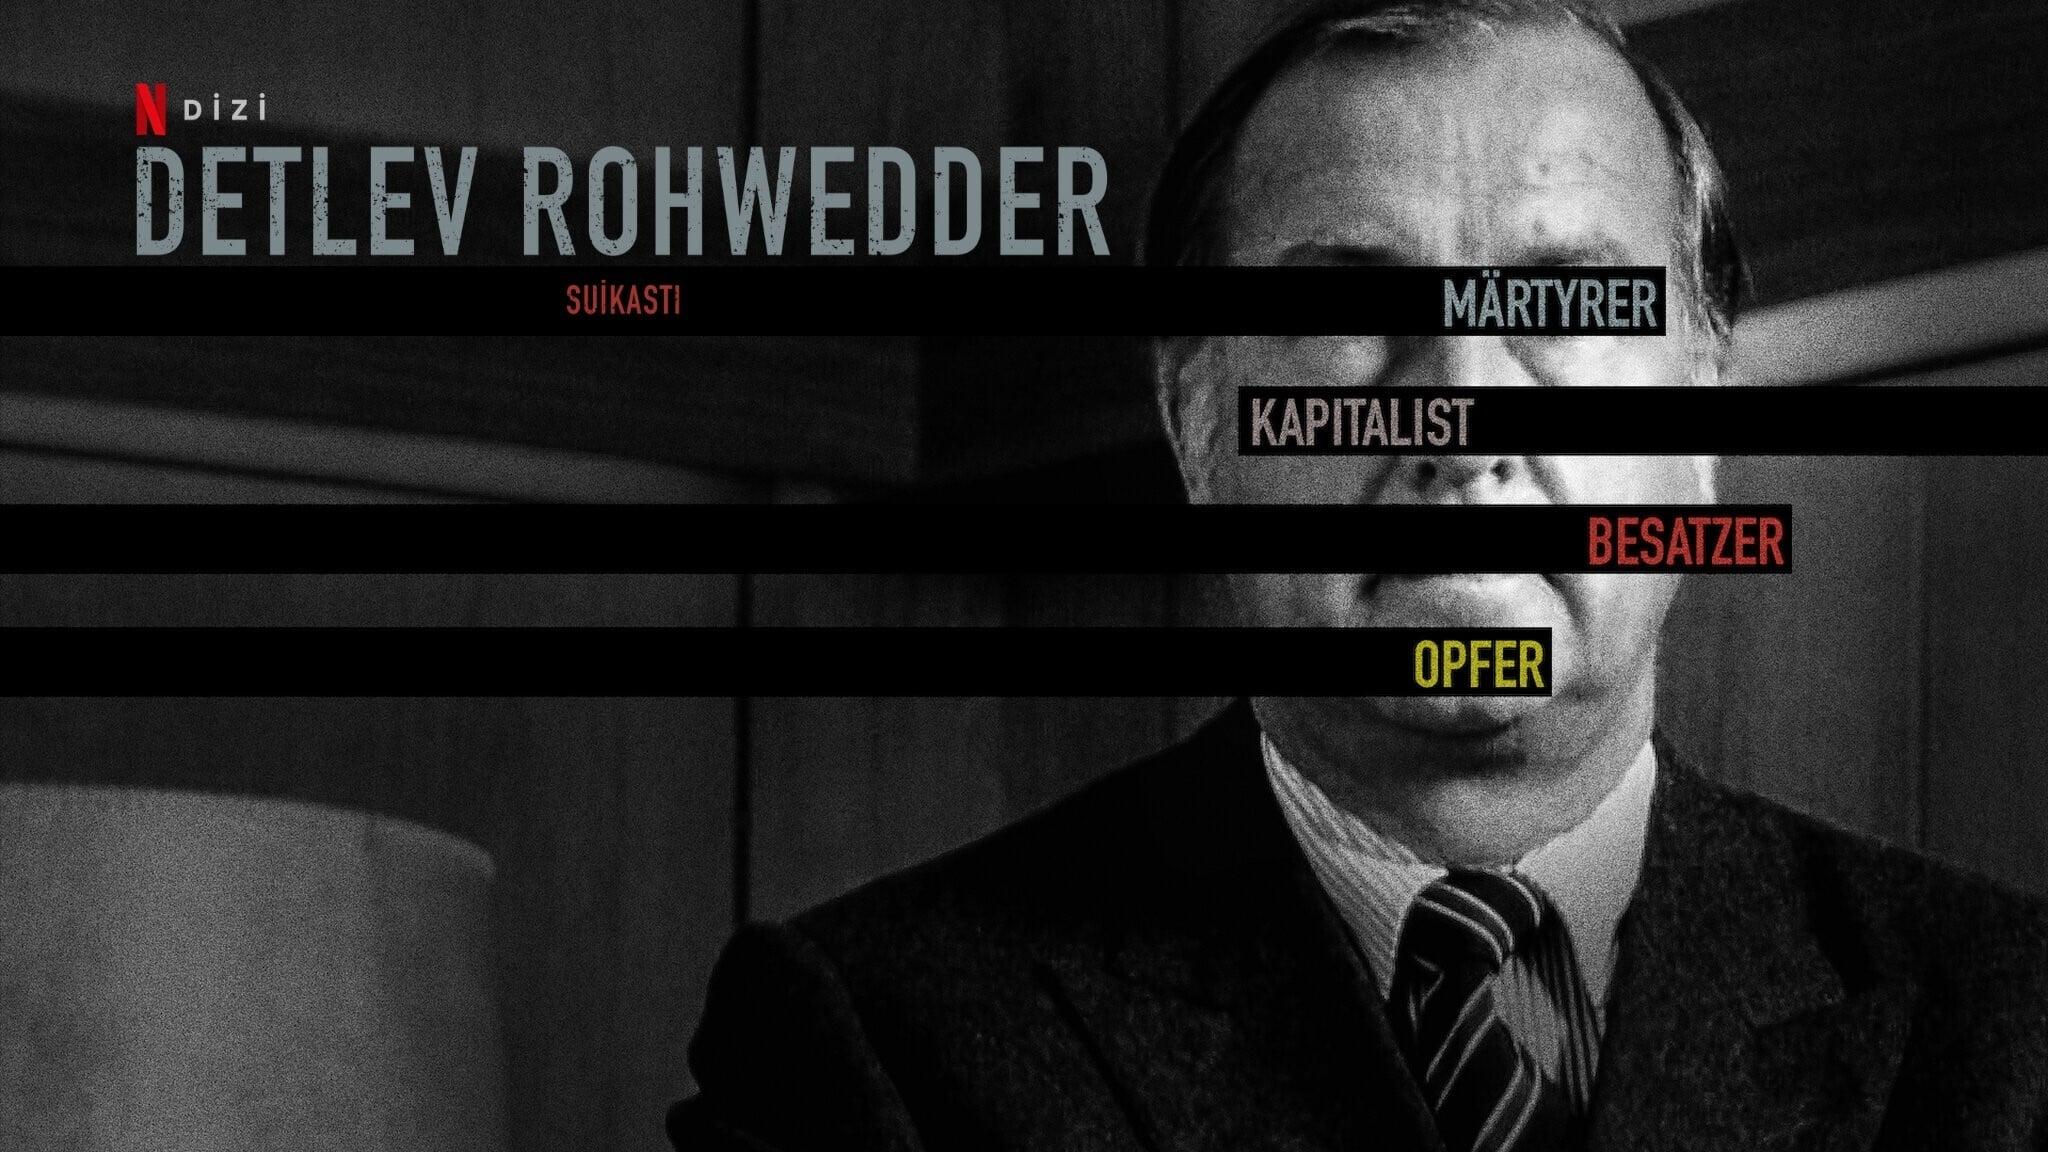 Detlev Rohwedder: Un crimen perfecto